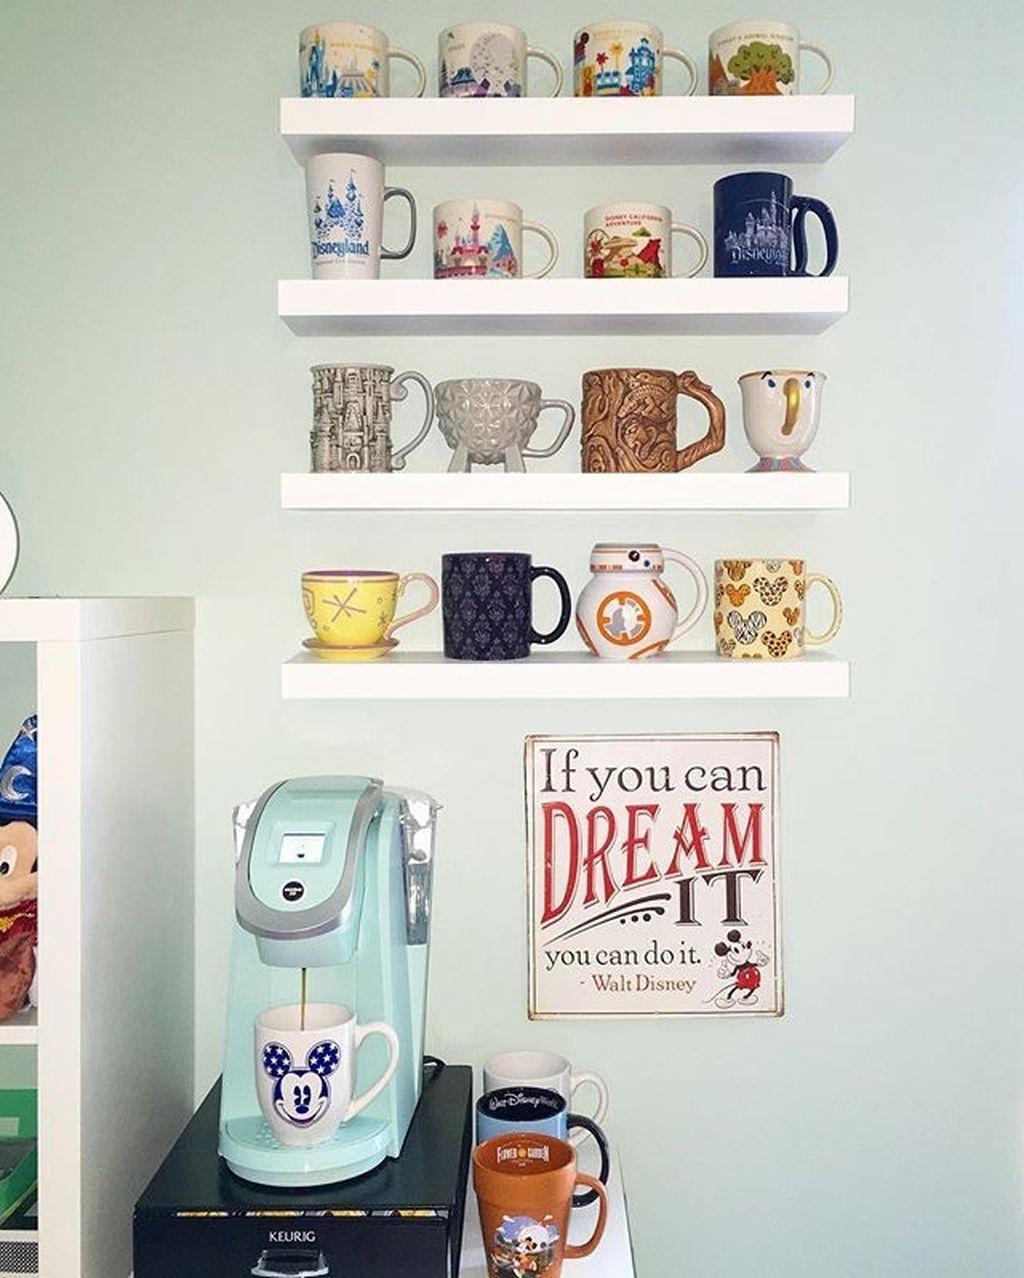 Adorable Disney Room Design Ideas For Your Childrens Room 03